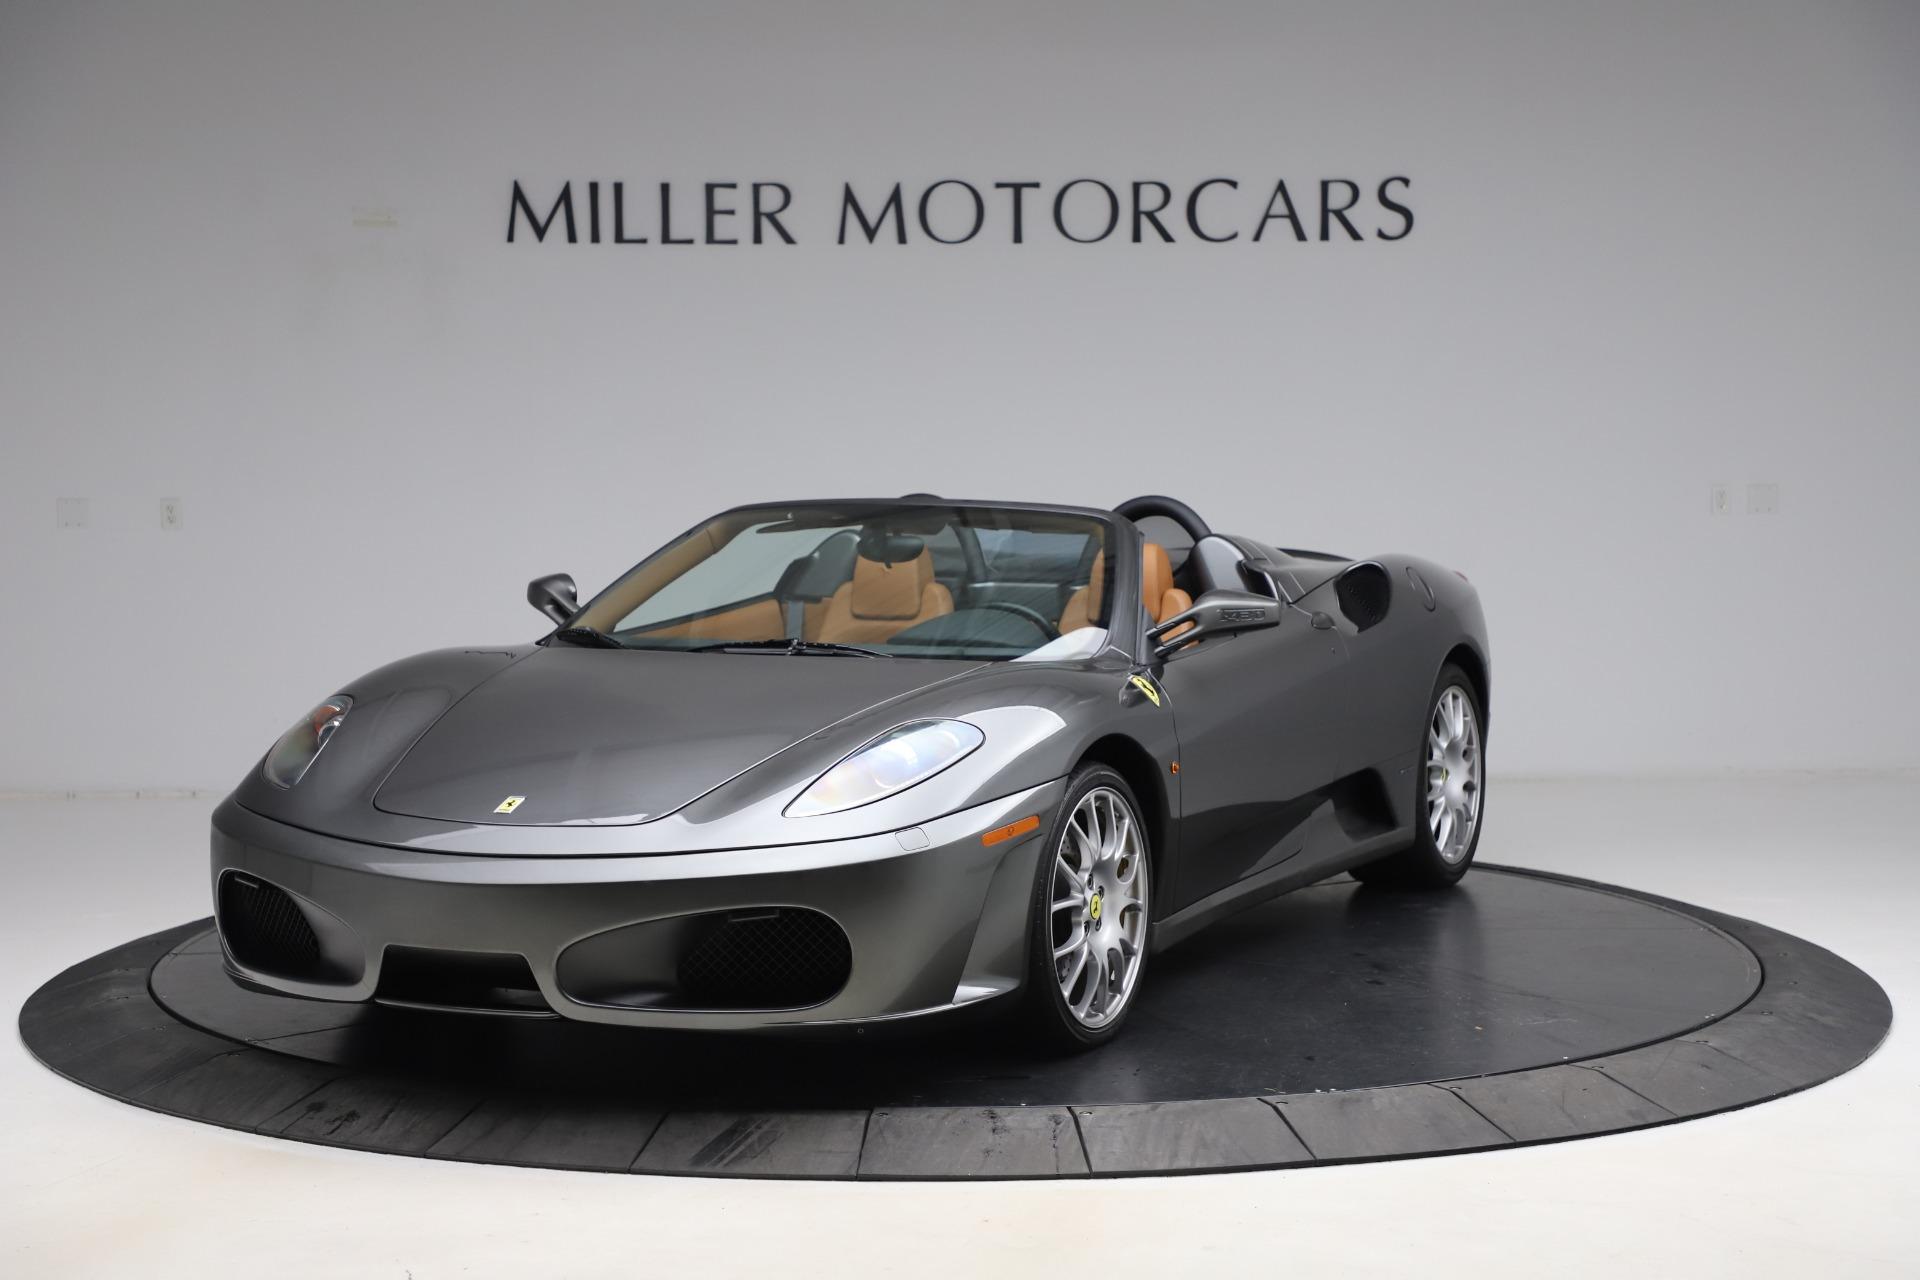 Used 2006 Ferrari F430 Spider for sale $249,900 at McLaren Greenwich in Greenwich CT 06830 1